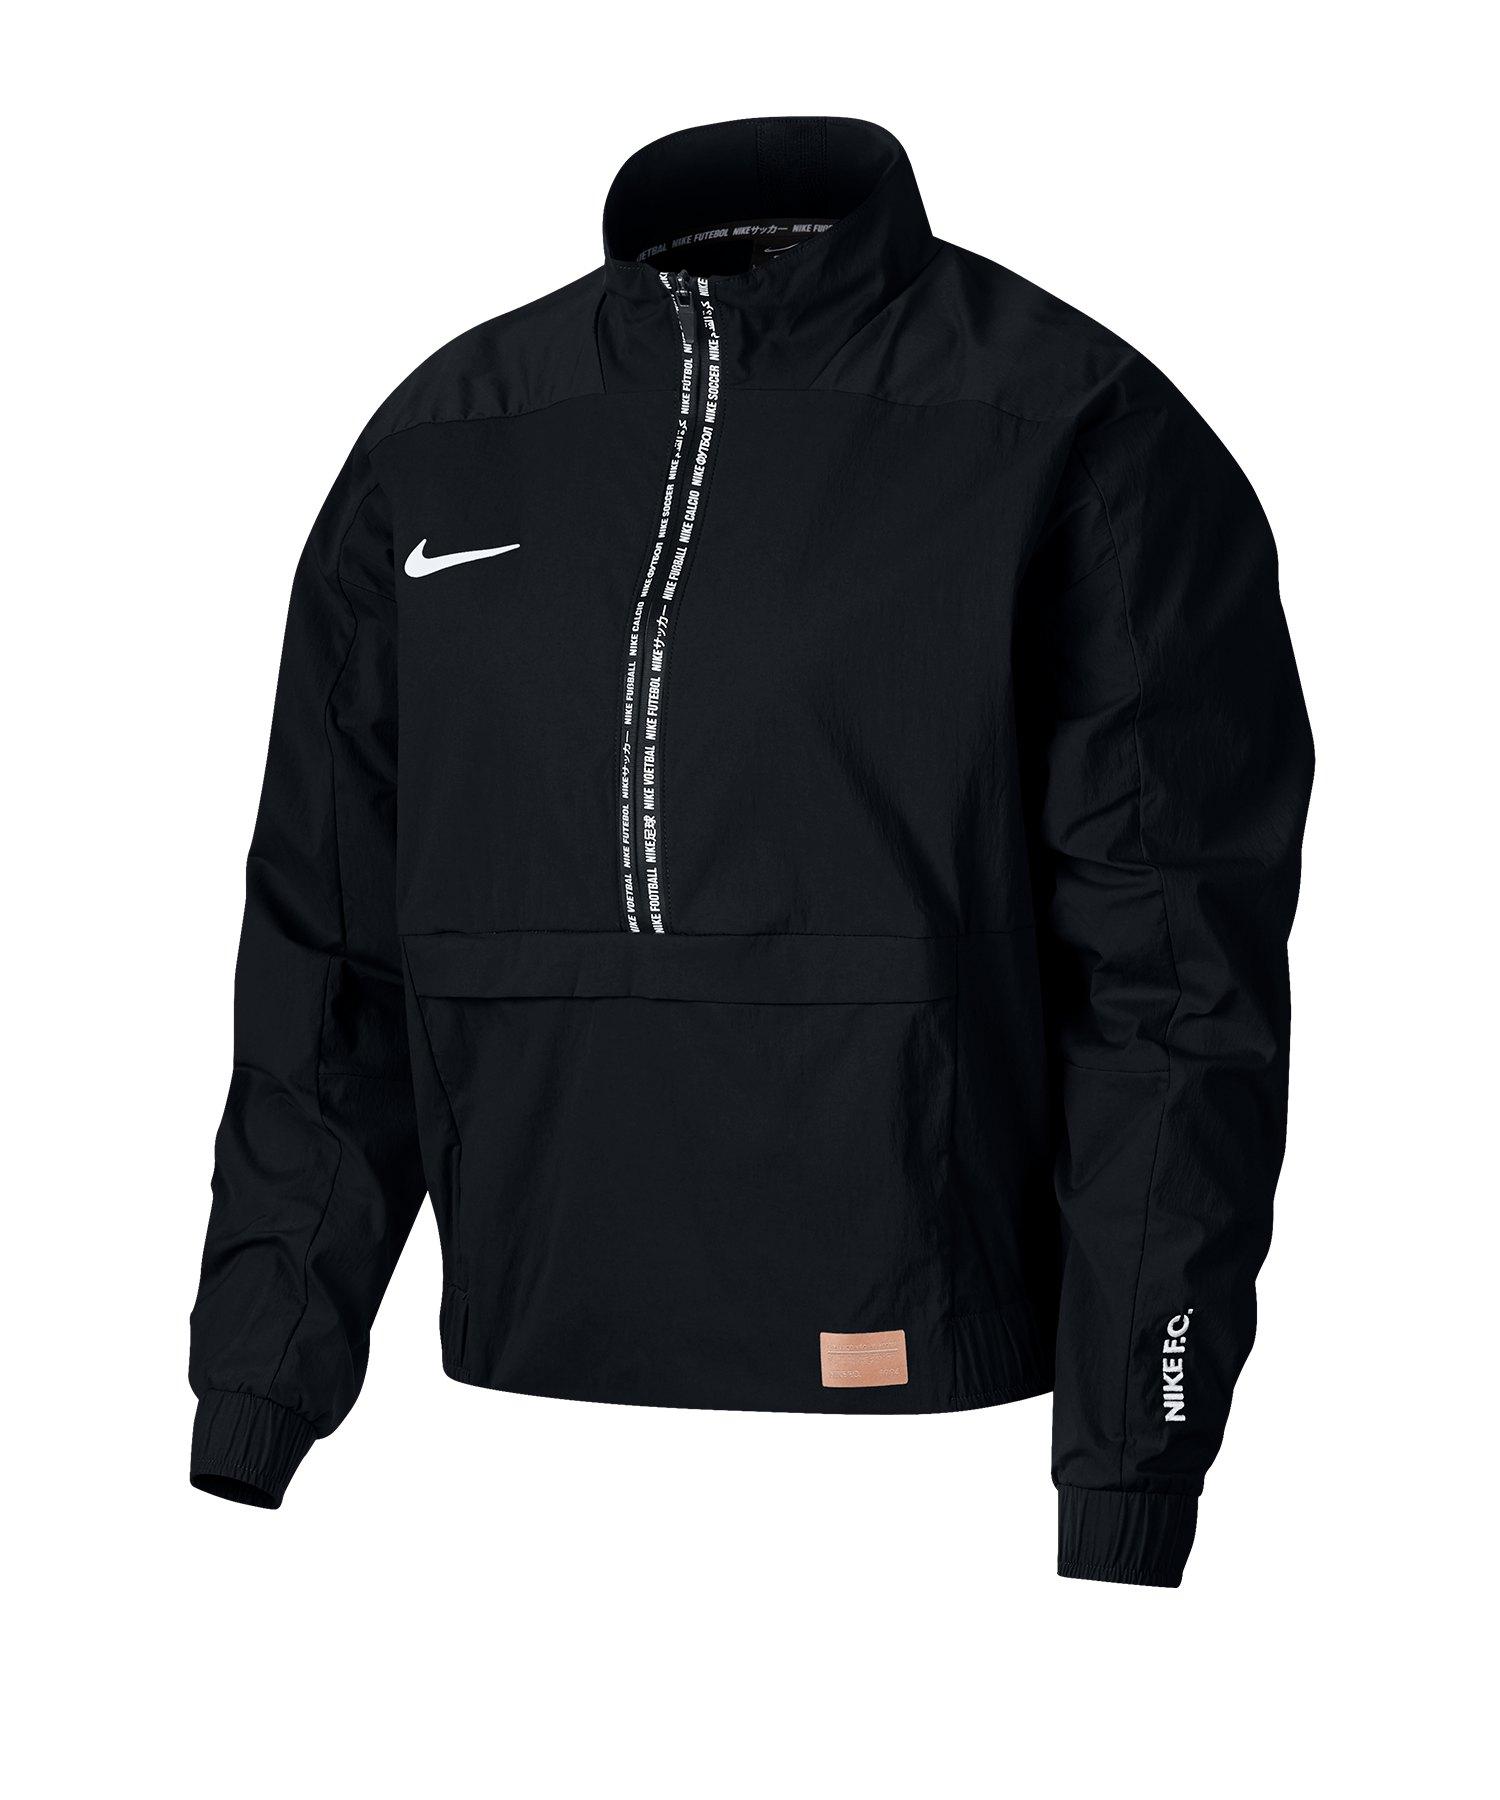 Nike F.C. Crop Jacket Jacke Damen Schwarz F010